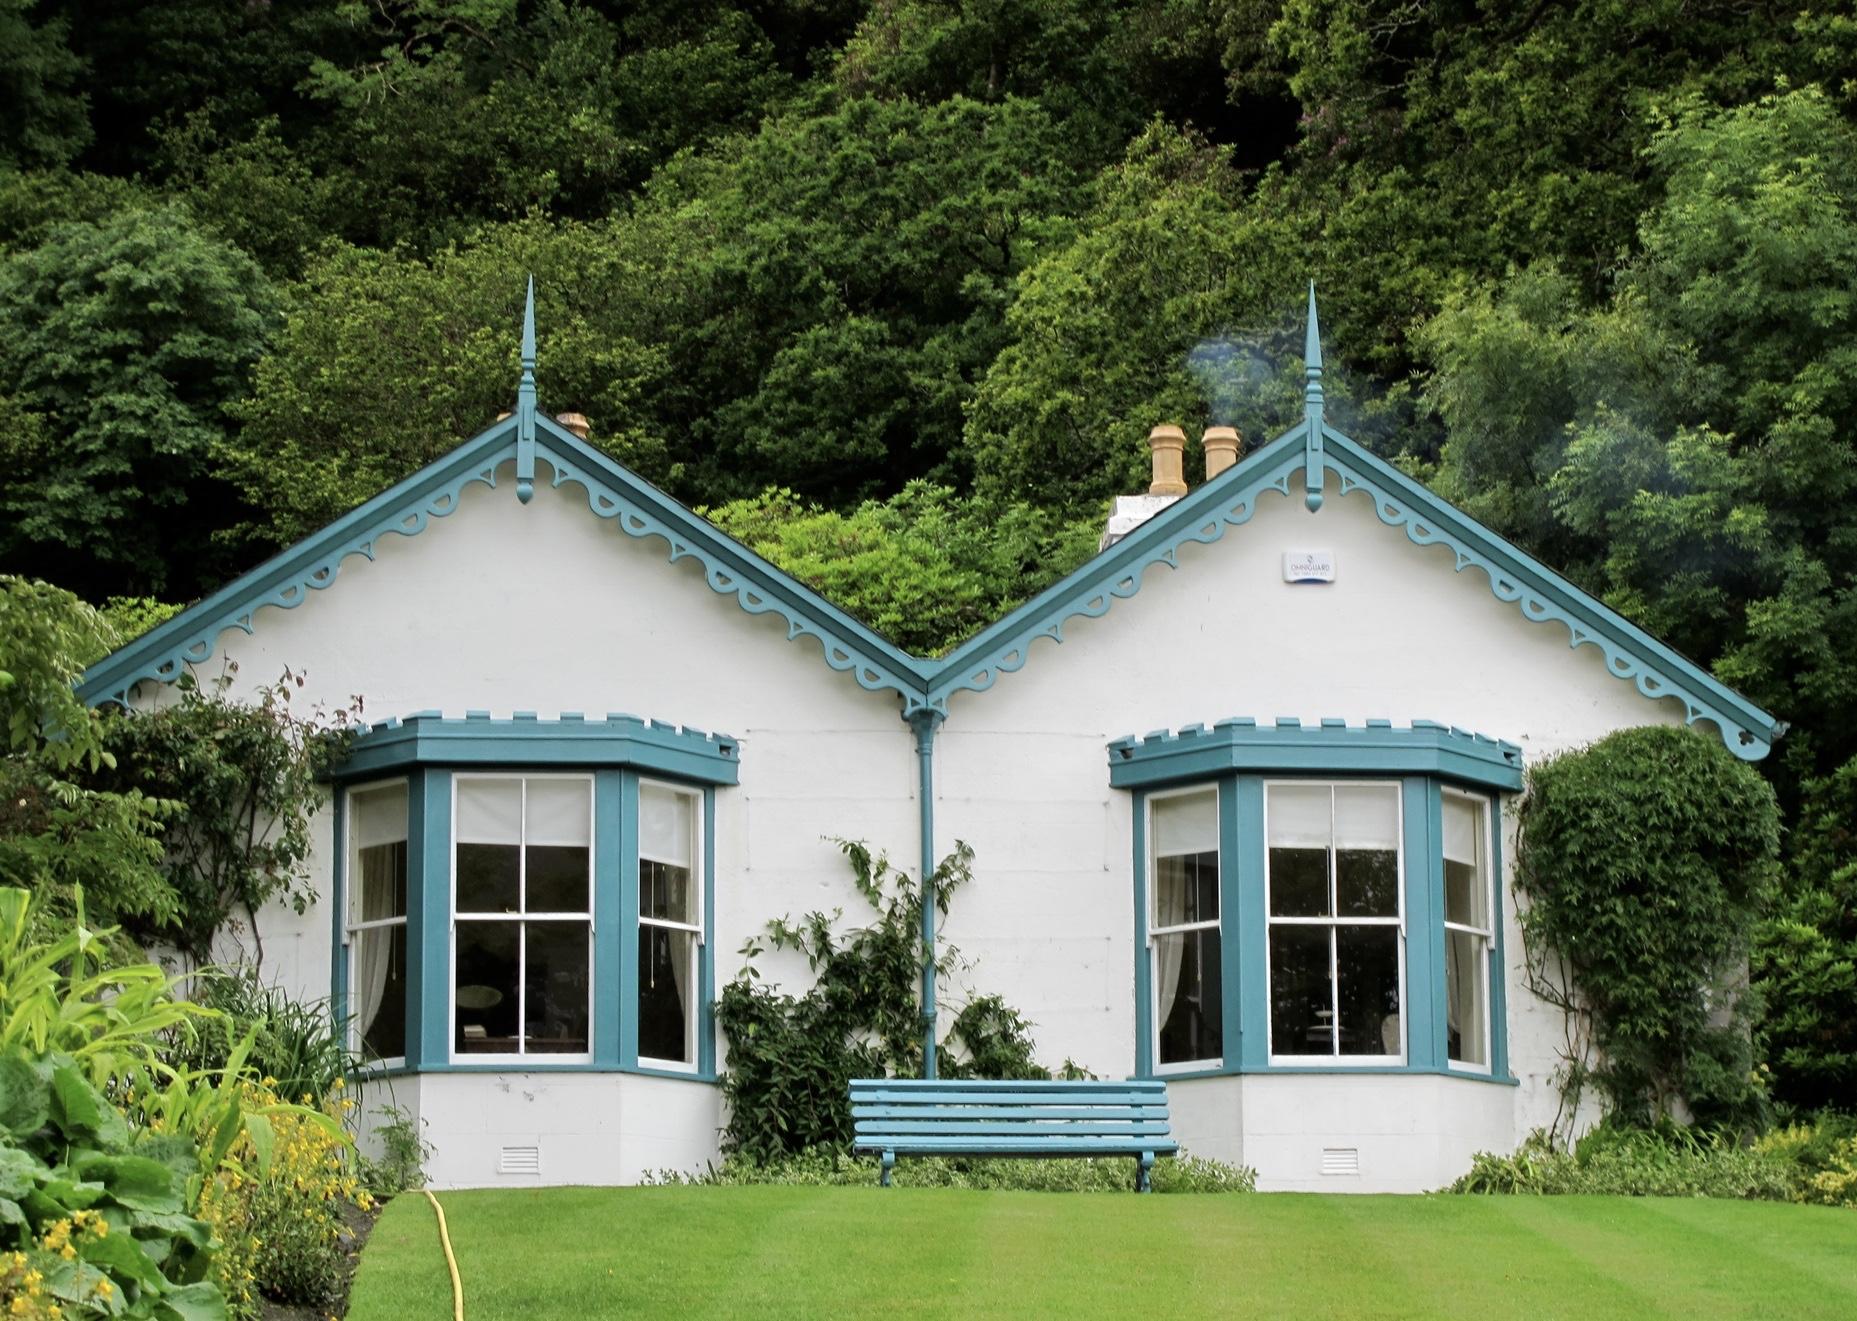 garden cottages kylemore